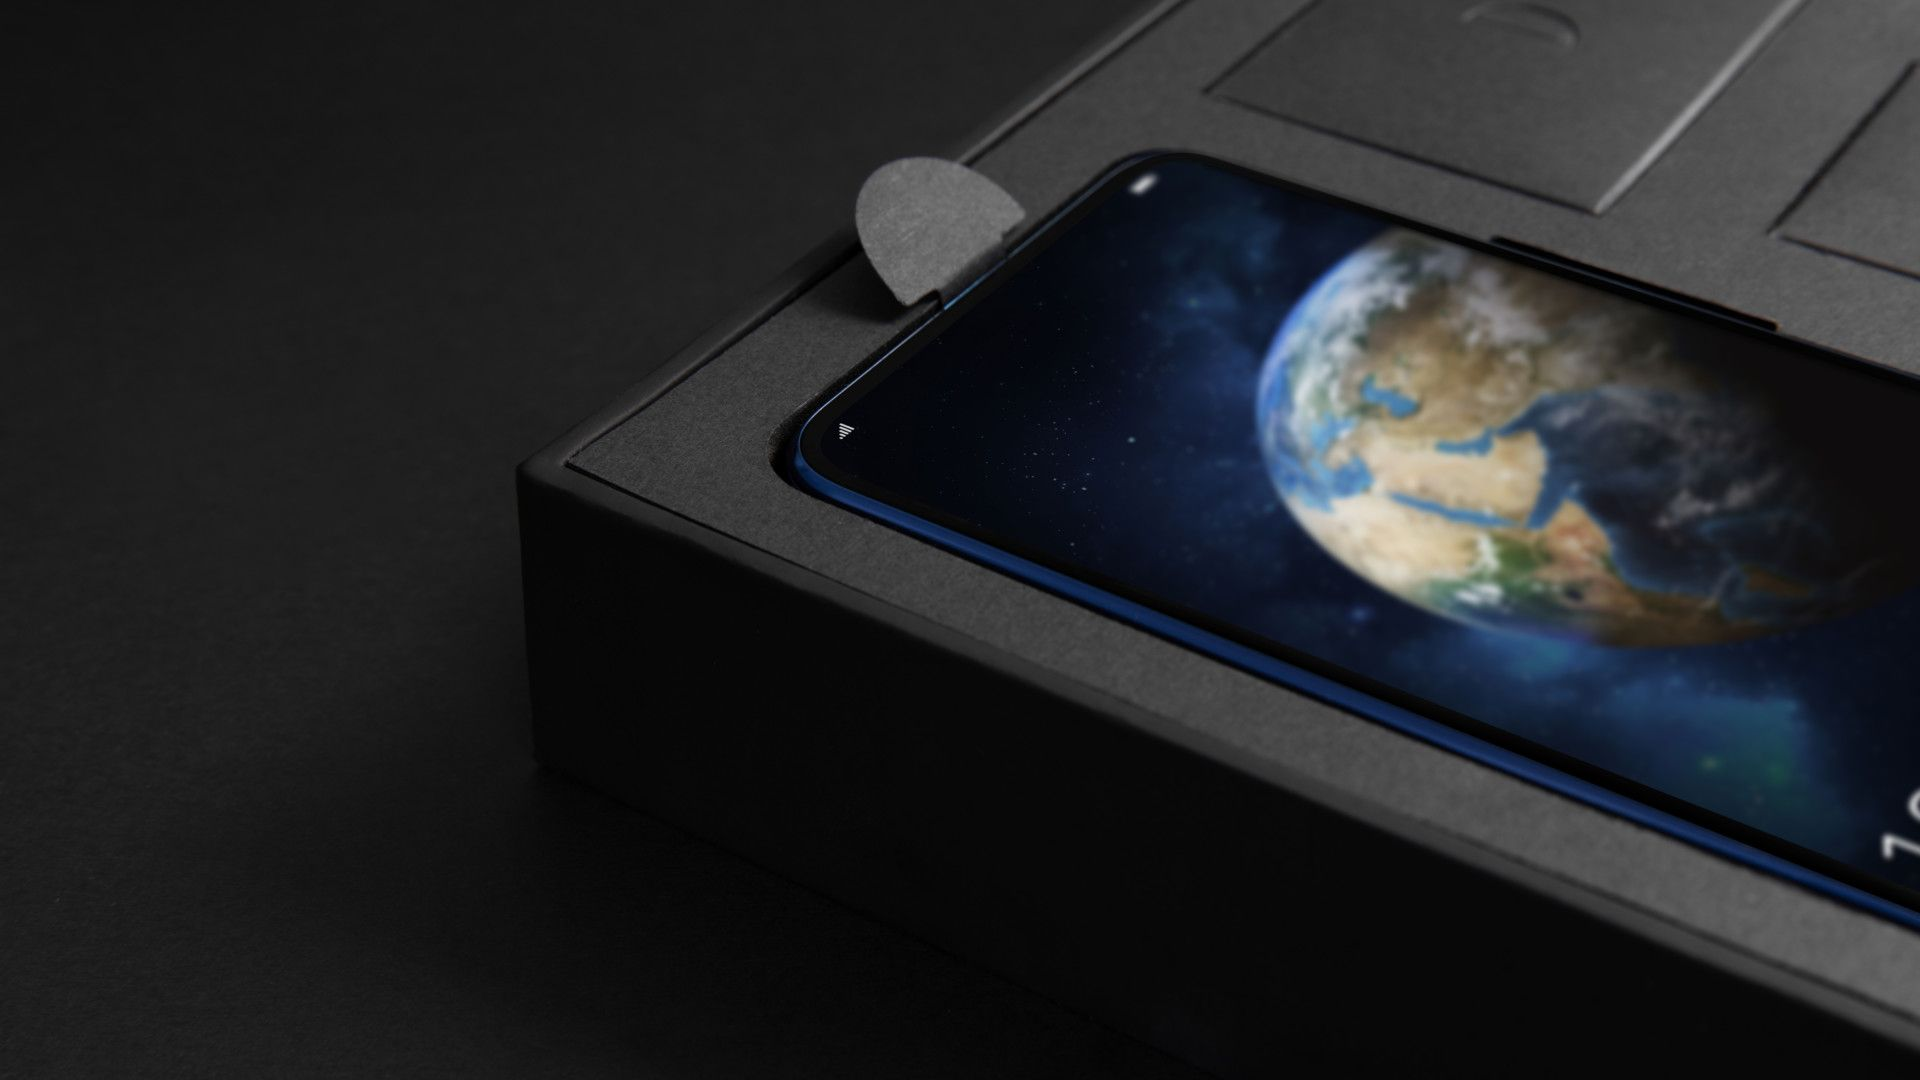 Honor Magic 2 3D. Обзор китайского смартфона